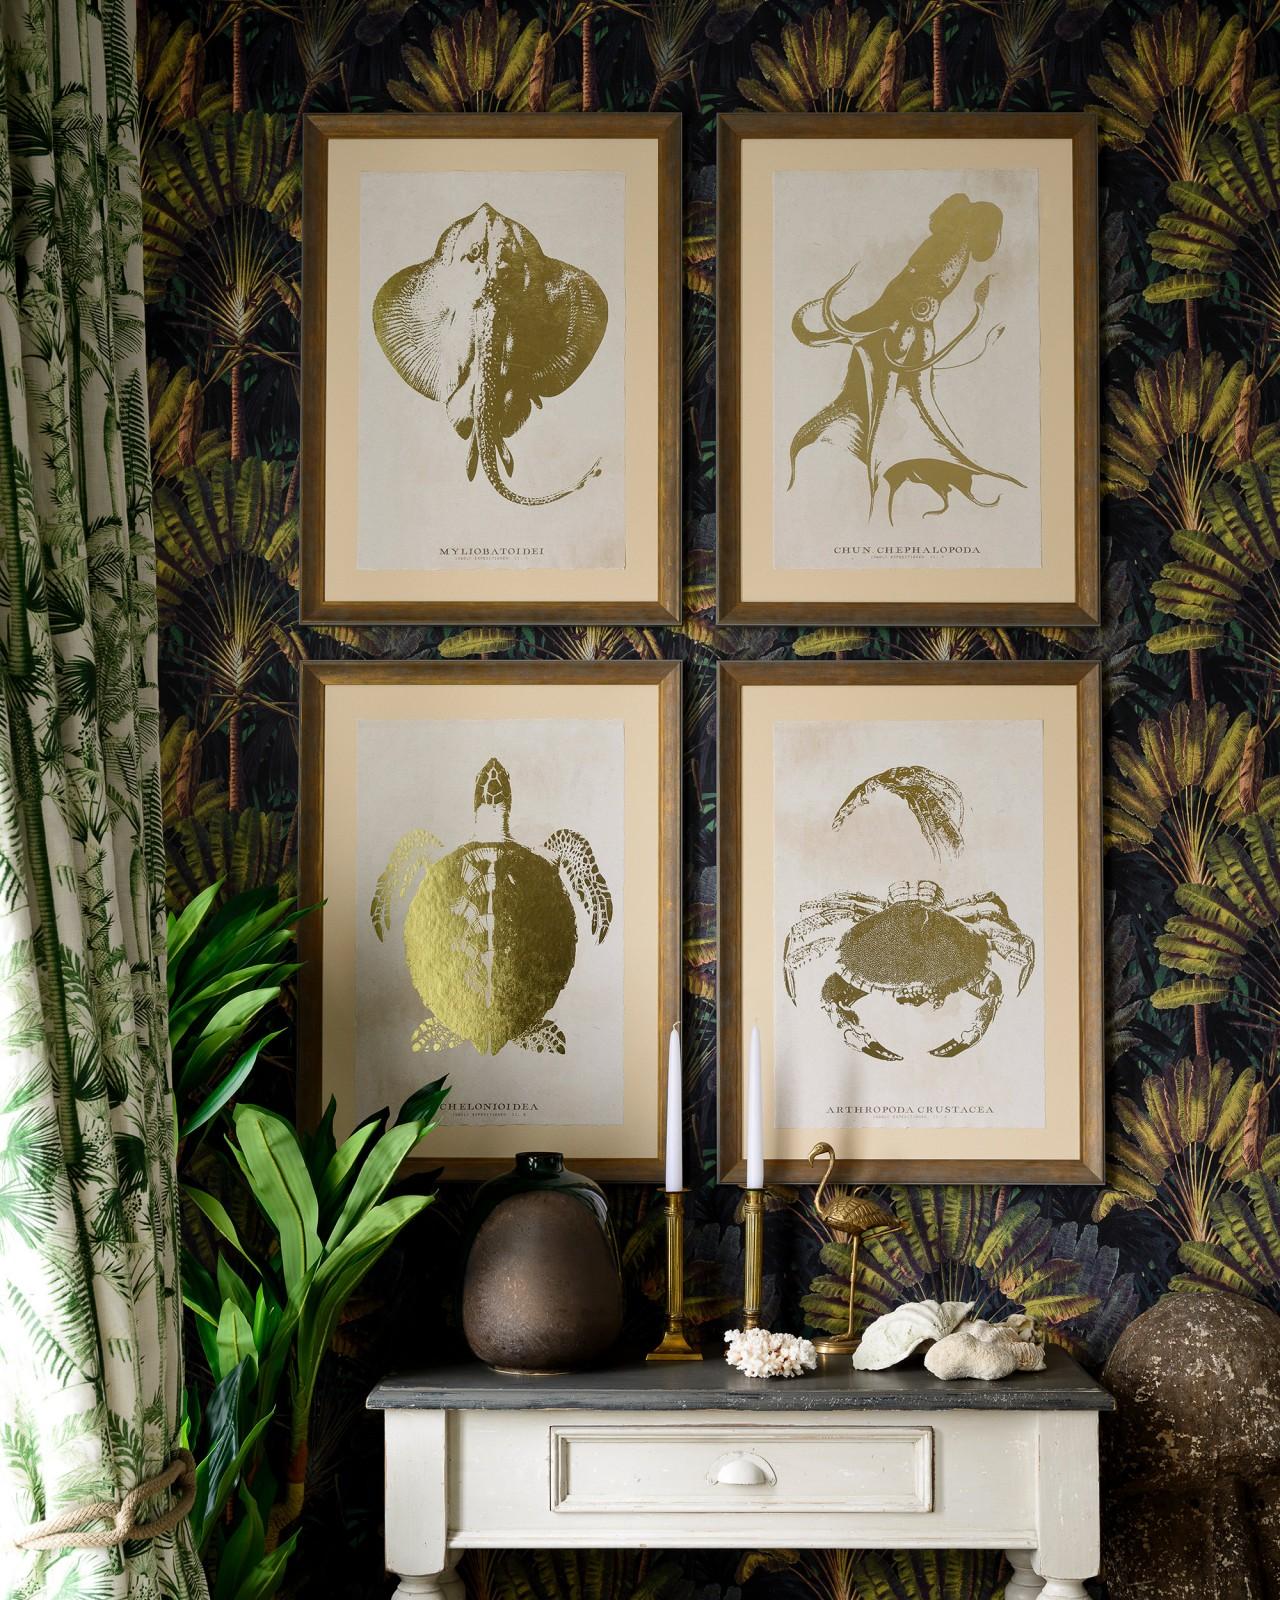 CARIBBEAN SEA LIFE - MYLIOBATOIDEI Framed Art